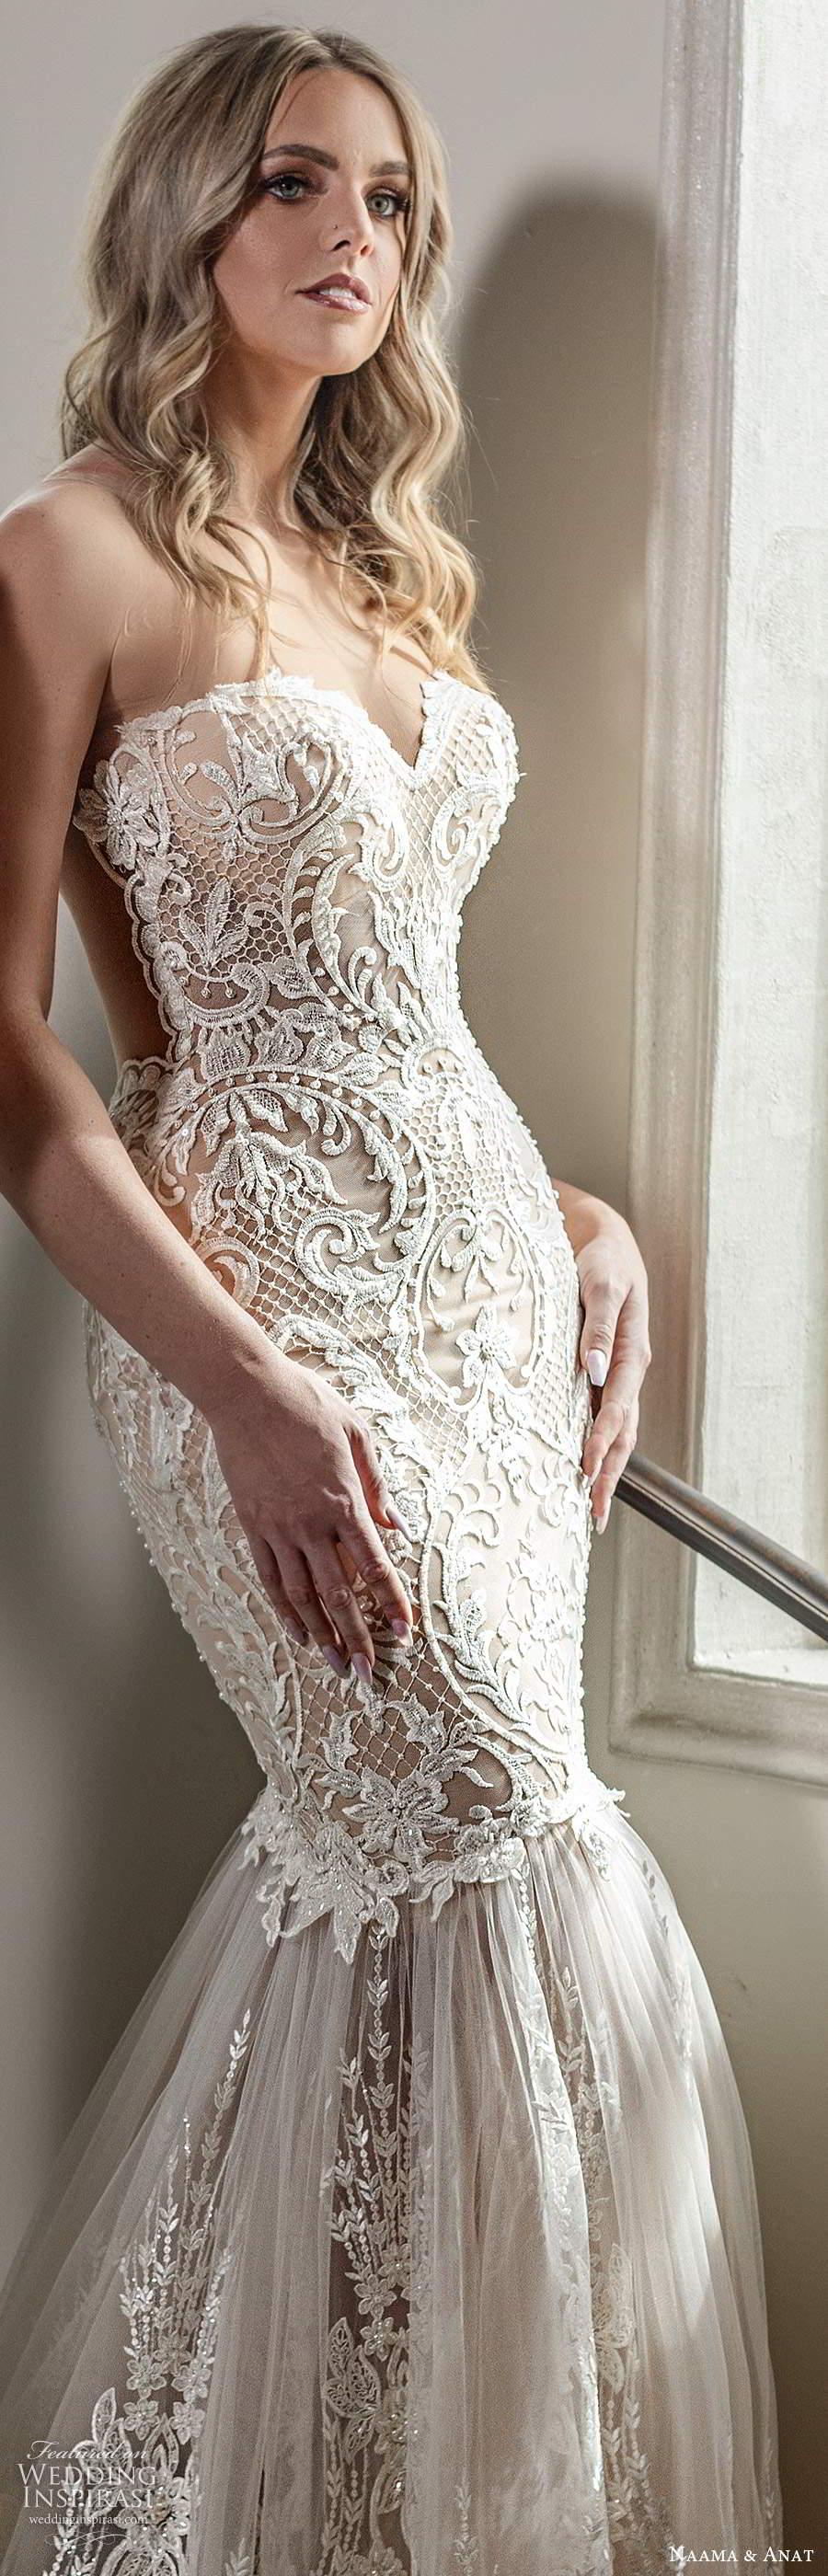 naama anat spring 2020 knottinghill bridal strapless sweetheart neckline fully embellished lace fit flare mermaid elegant wedding dress chapel train (1) zv